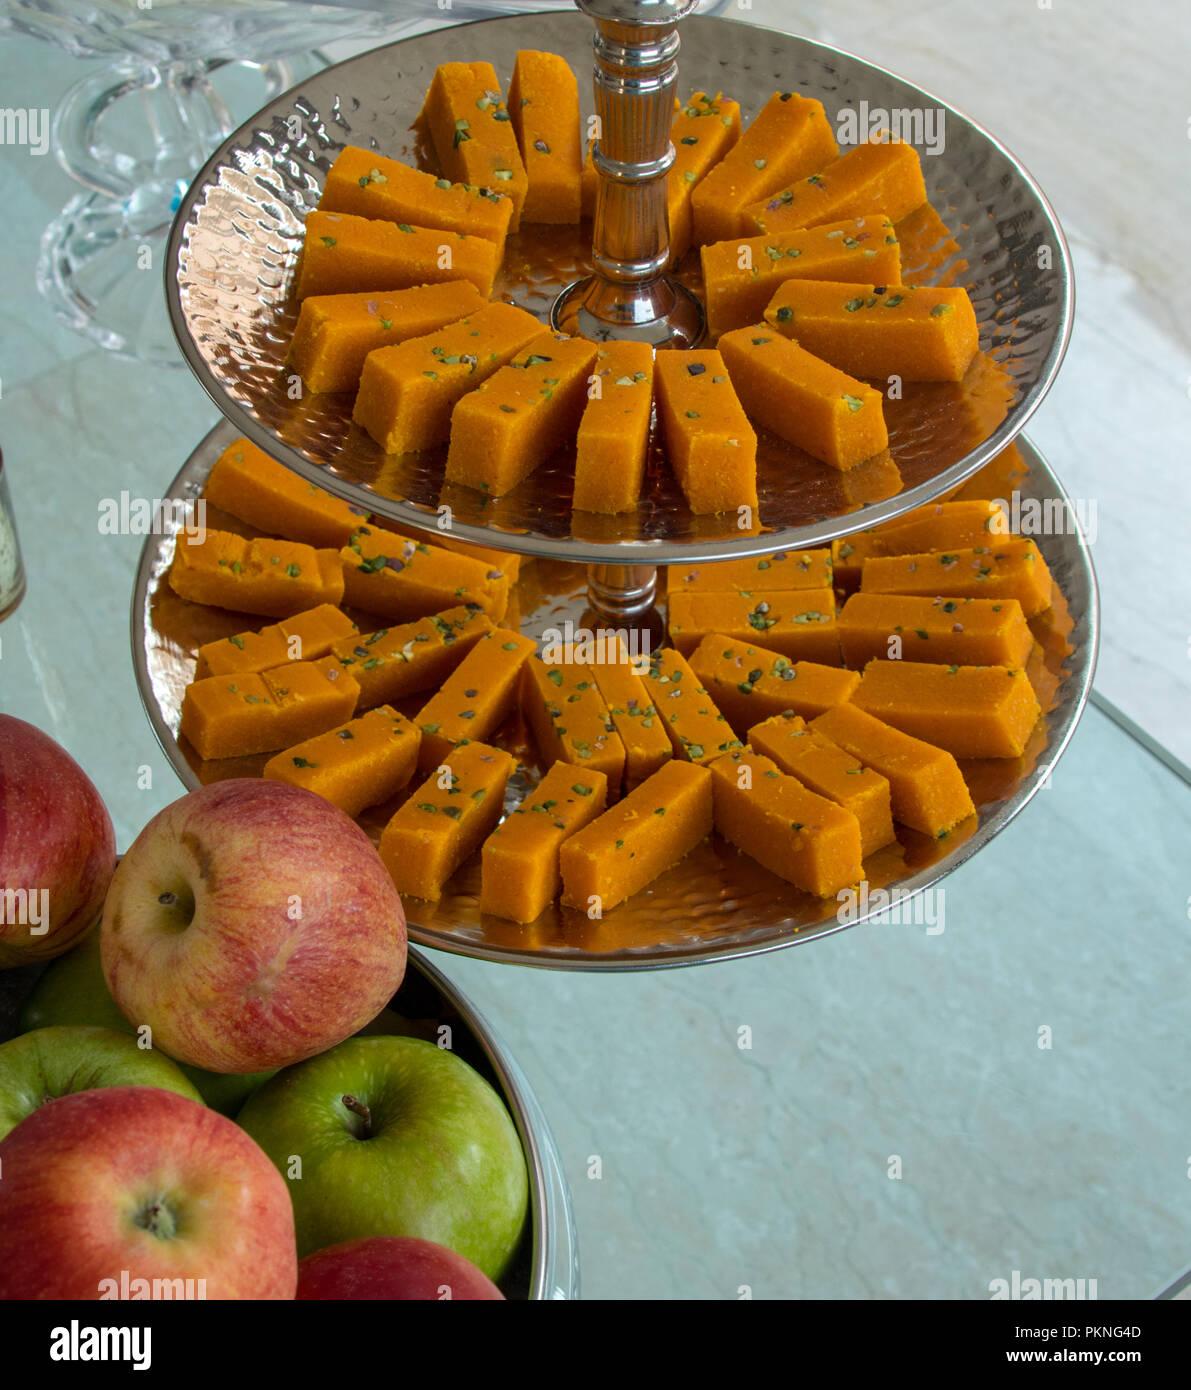 semolina dessert and apples on glass table - Stock Image